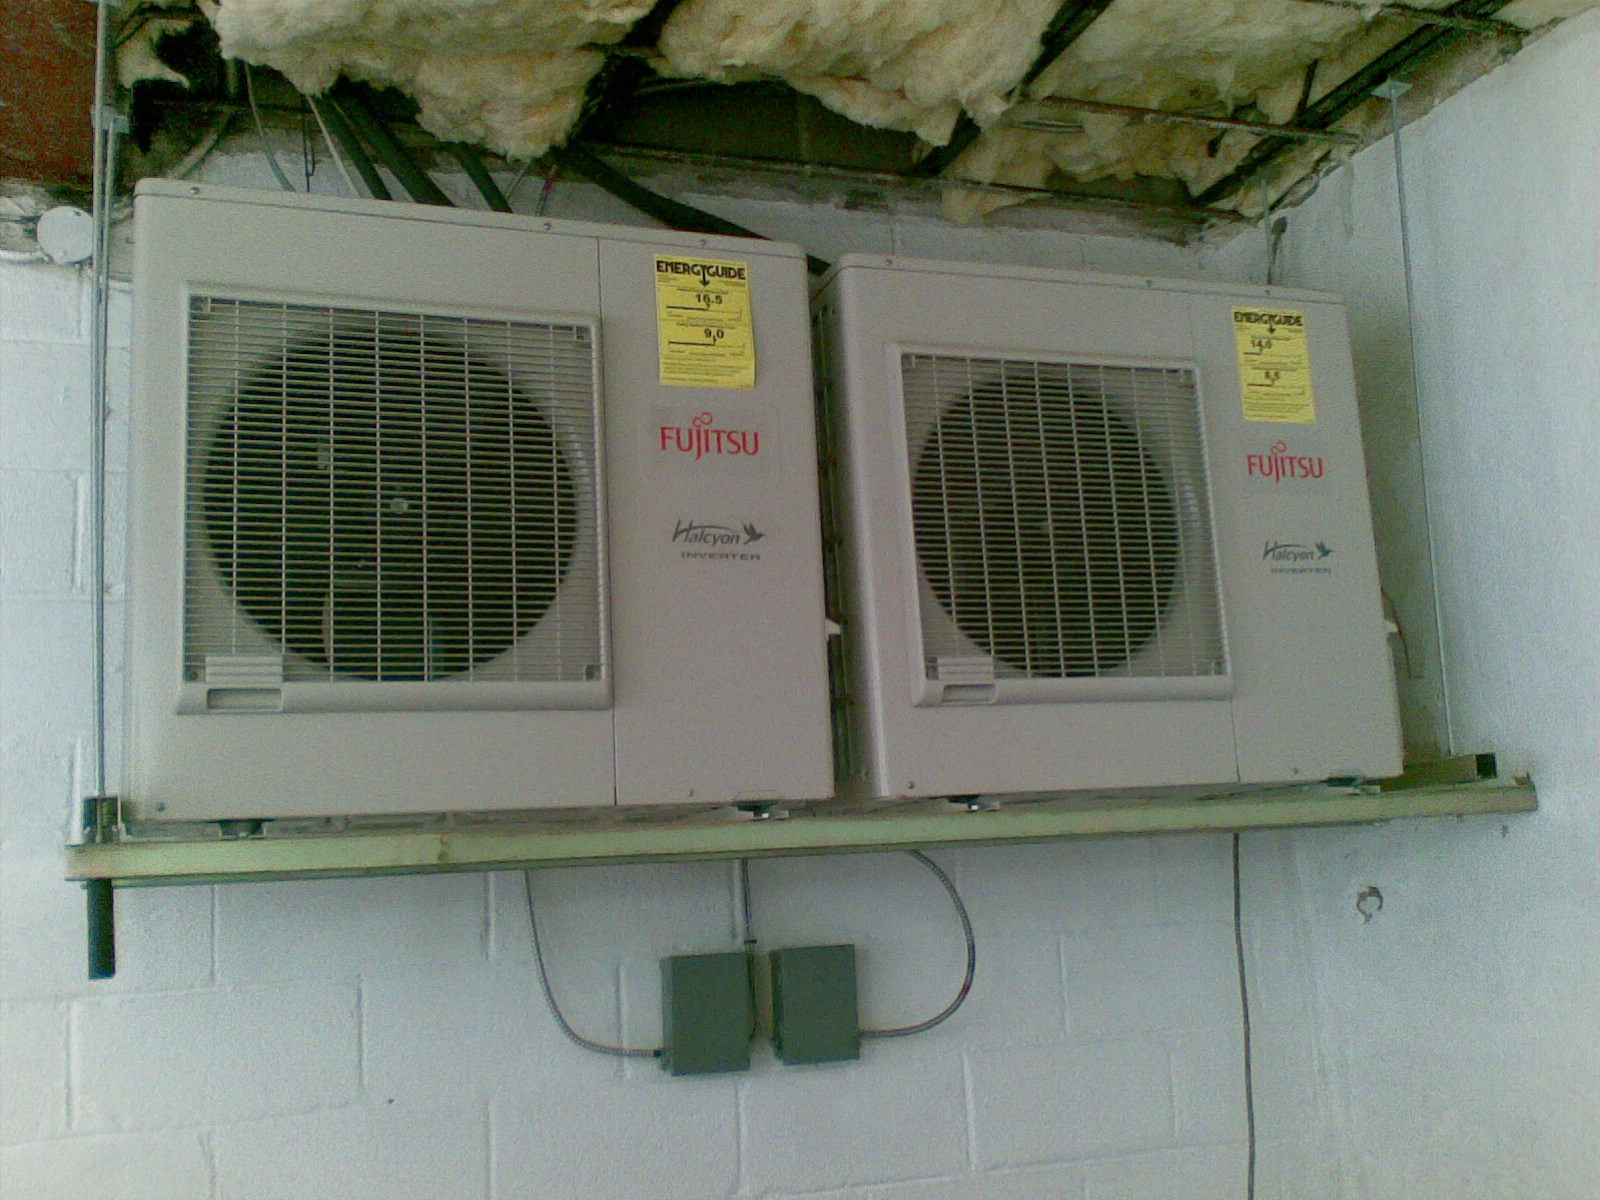 fujitsu ductless split wiring diagram c5 corvette mini installation examples air